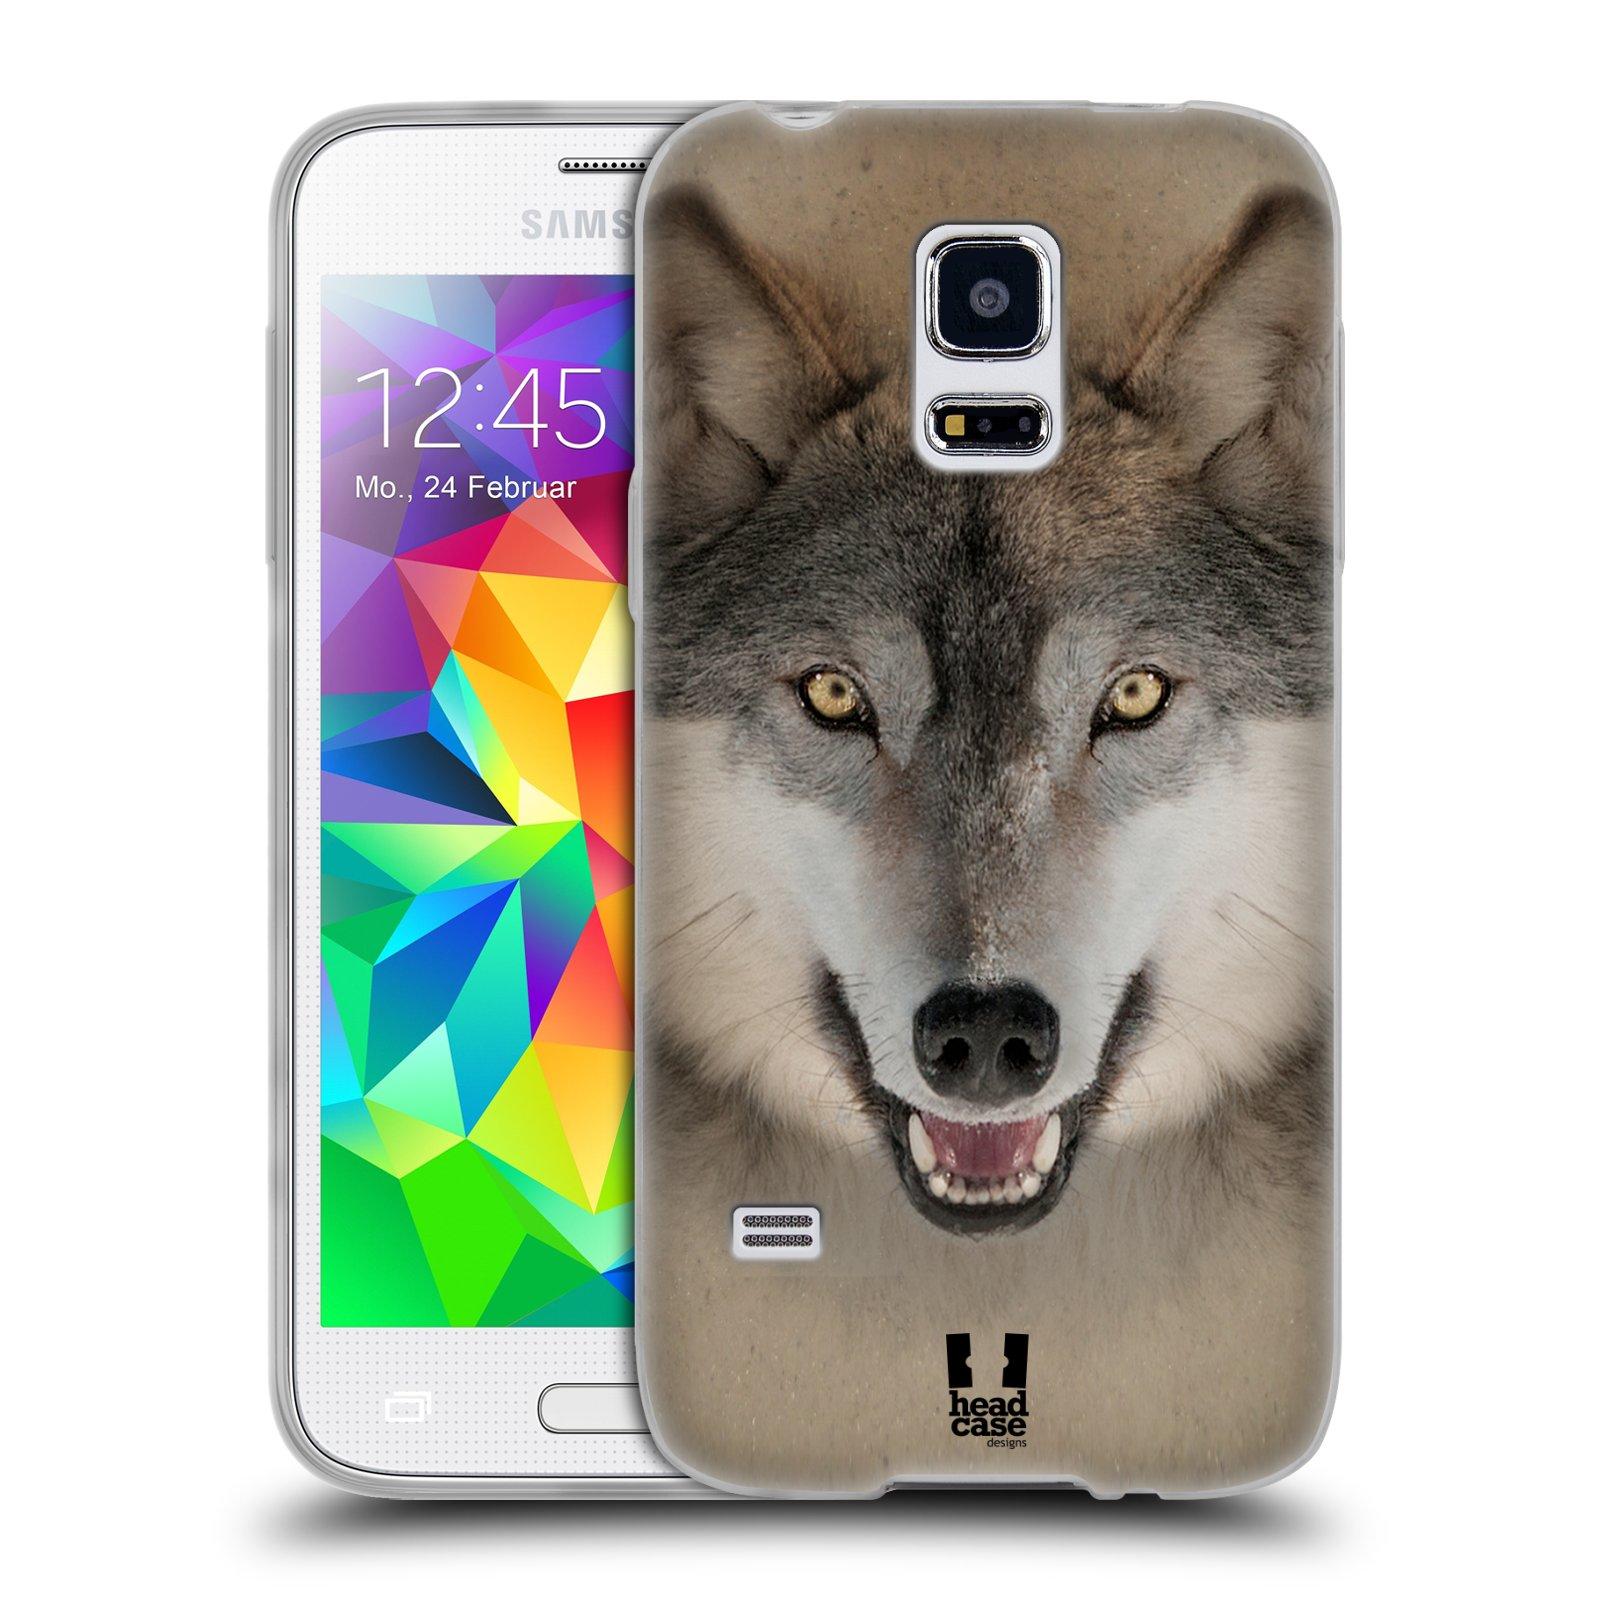 HEAD CASE silikonový obal na mobil Samsung Galaxy S5 MINI vzor Zvířecí tváře 2 vlk šedý